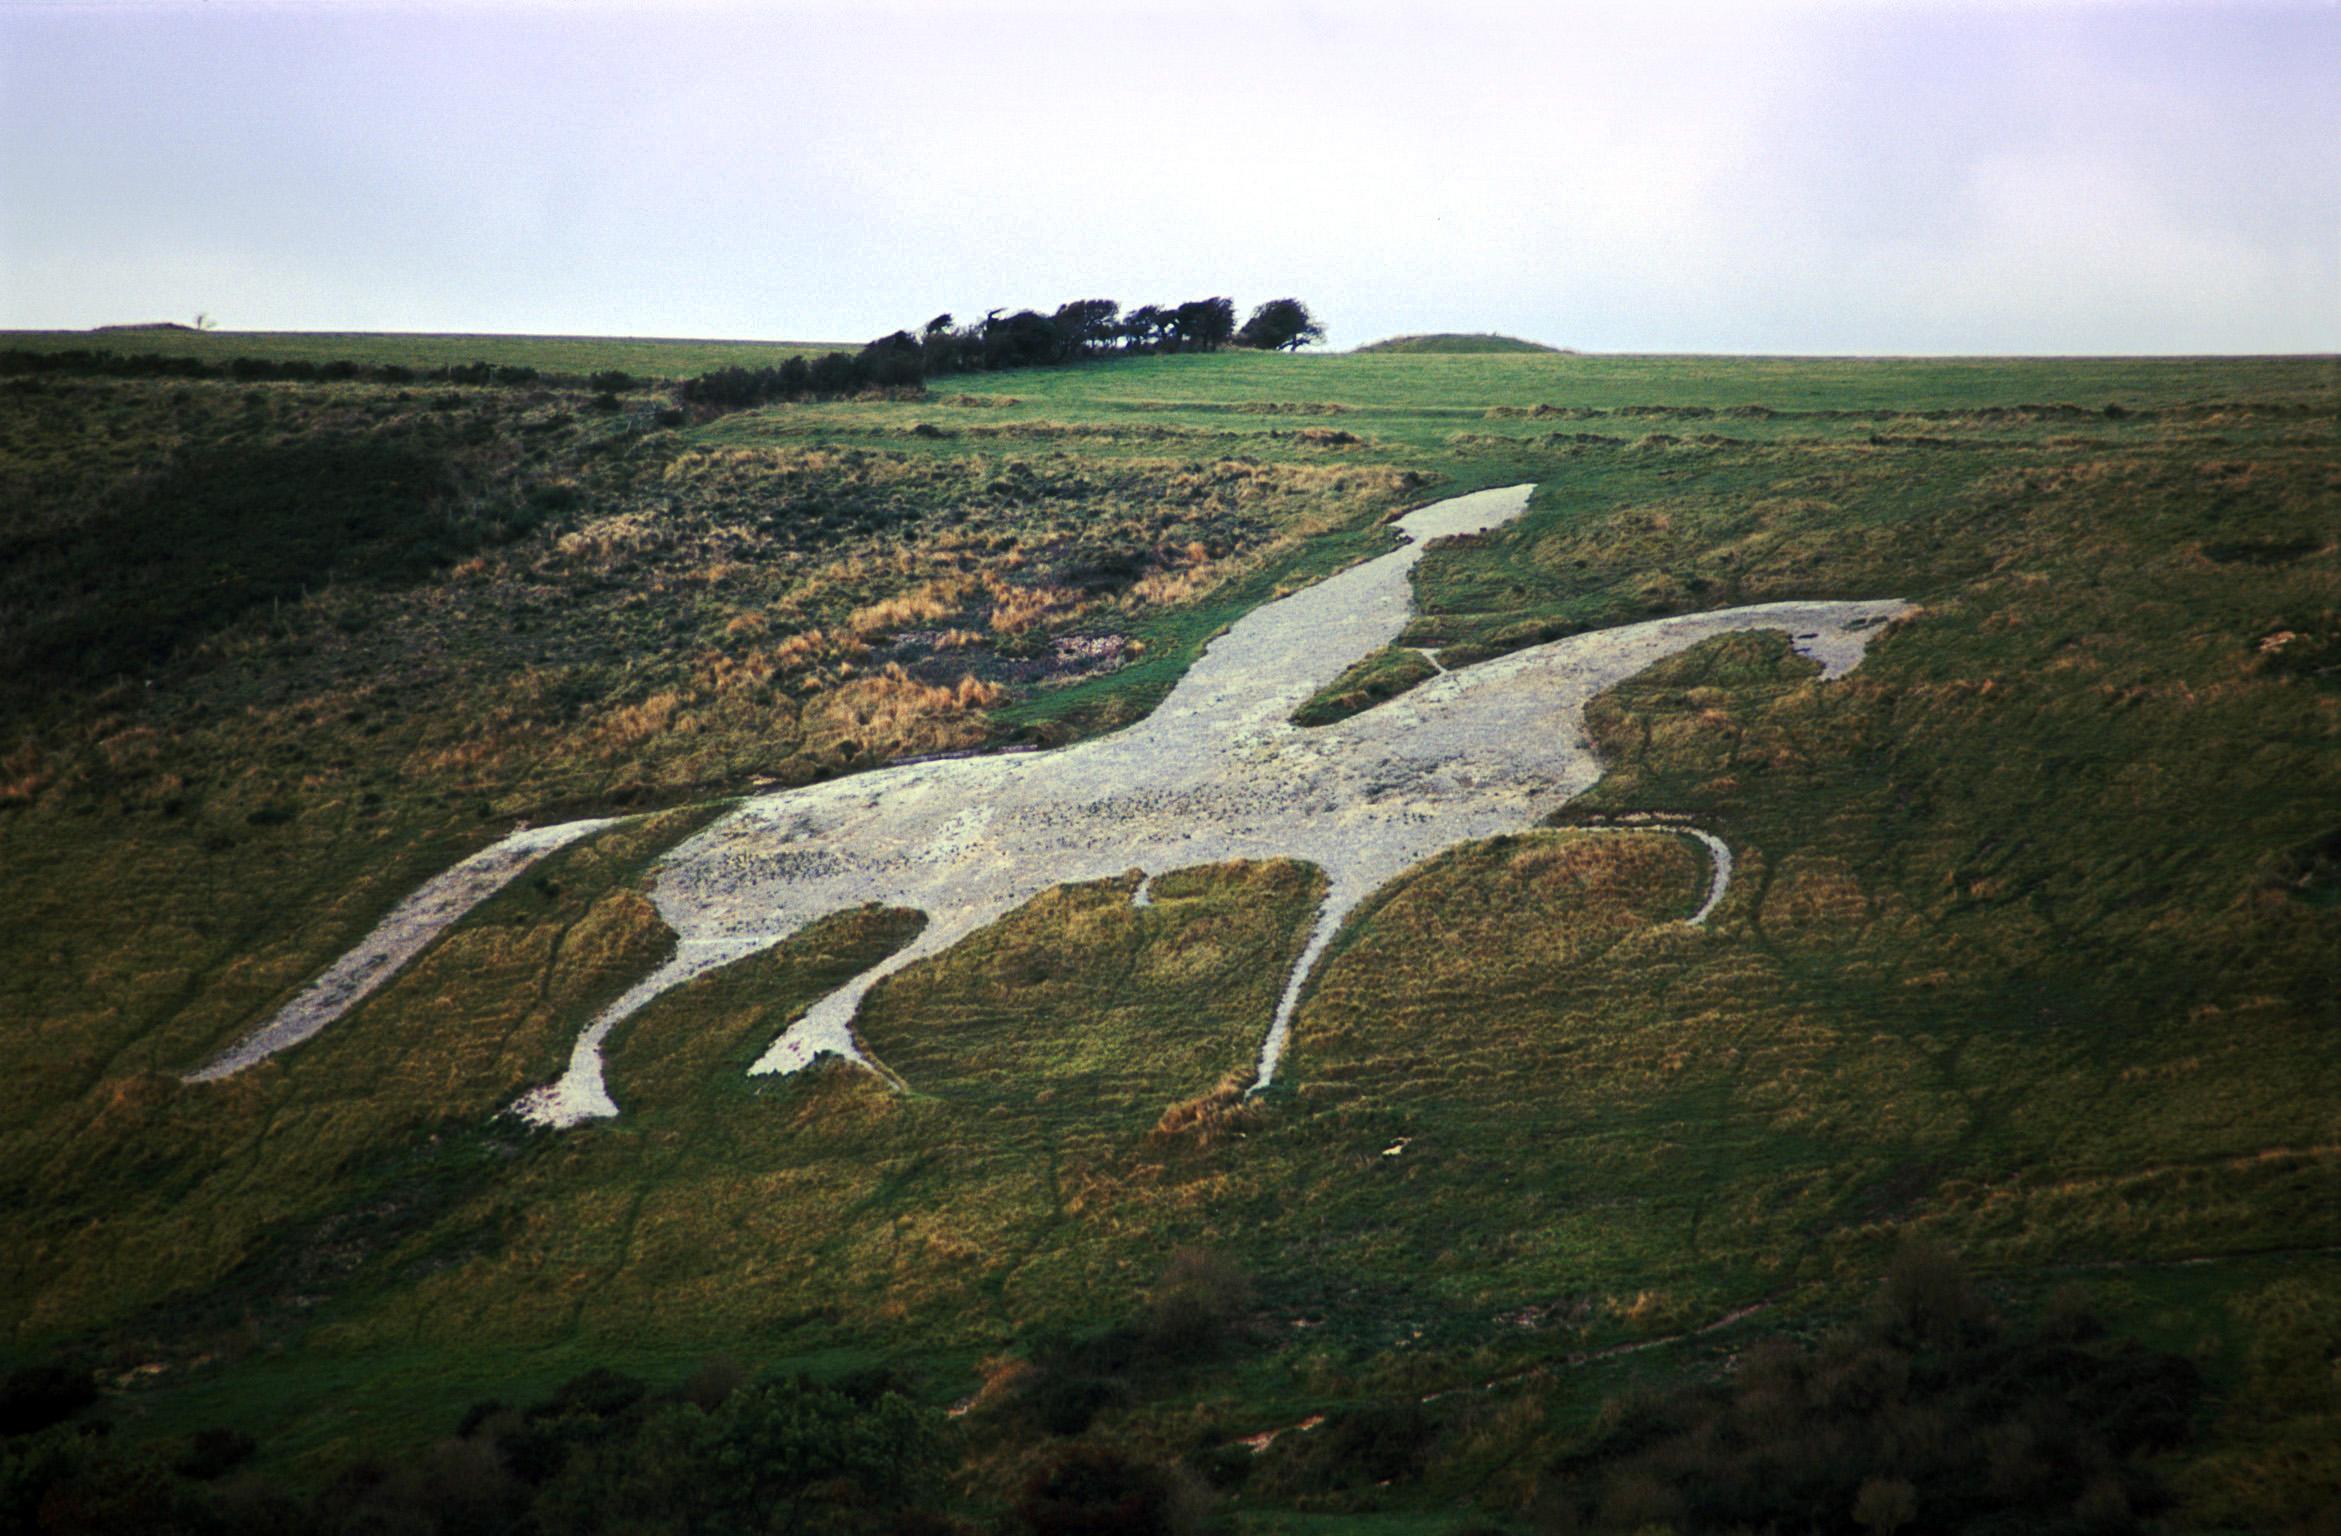 Free Stock photo of white horse near osmington dorset.